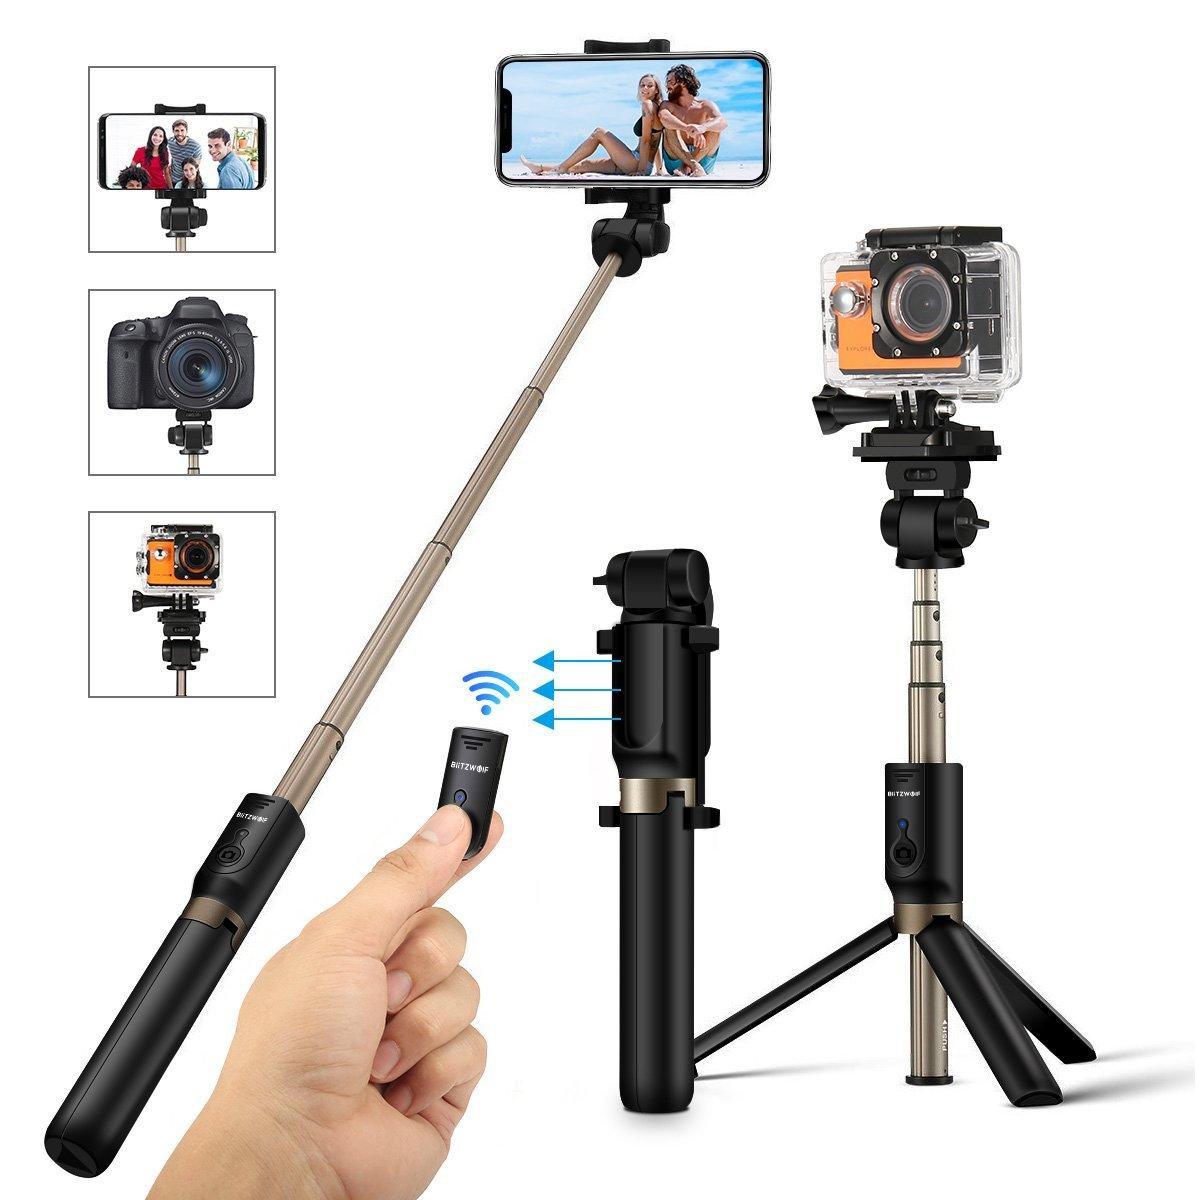 BlitzWolf BW-BS3 Versatile 3 in 1 Bluetooth Tripod Selfie Stick @ banggood £10.89